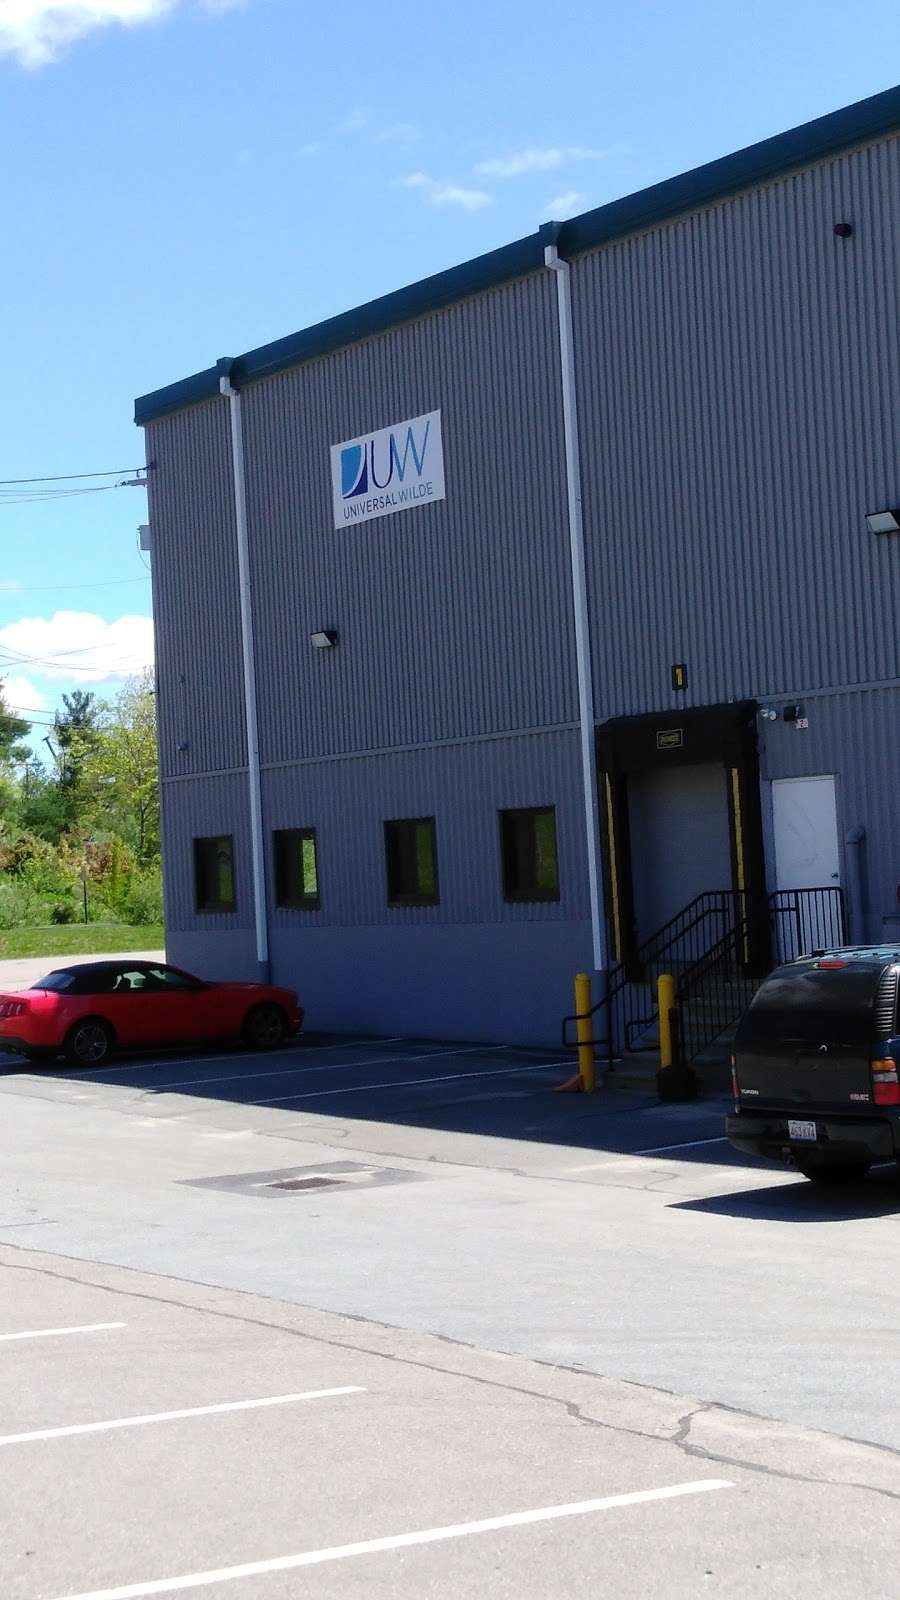 UNIVERSAL WILDE - storage  | Photo 1 of 1 | Address: 675 Canton St, Norwood, MA 02062, USA | Phone: (781) 251-2700